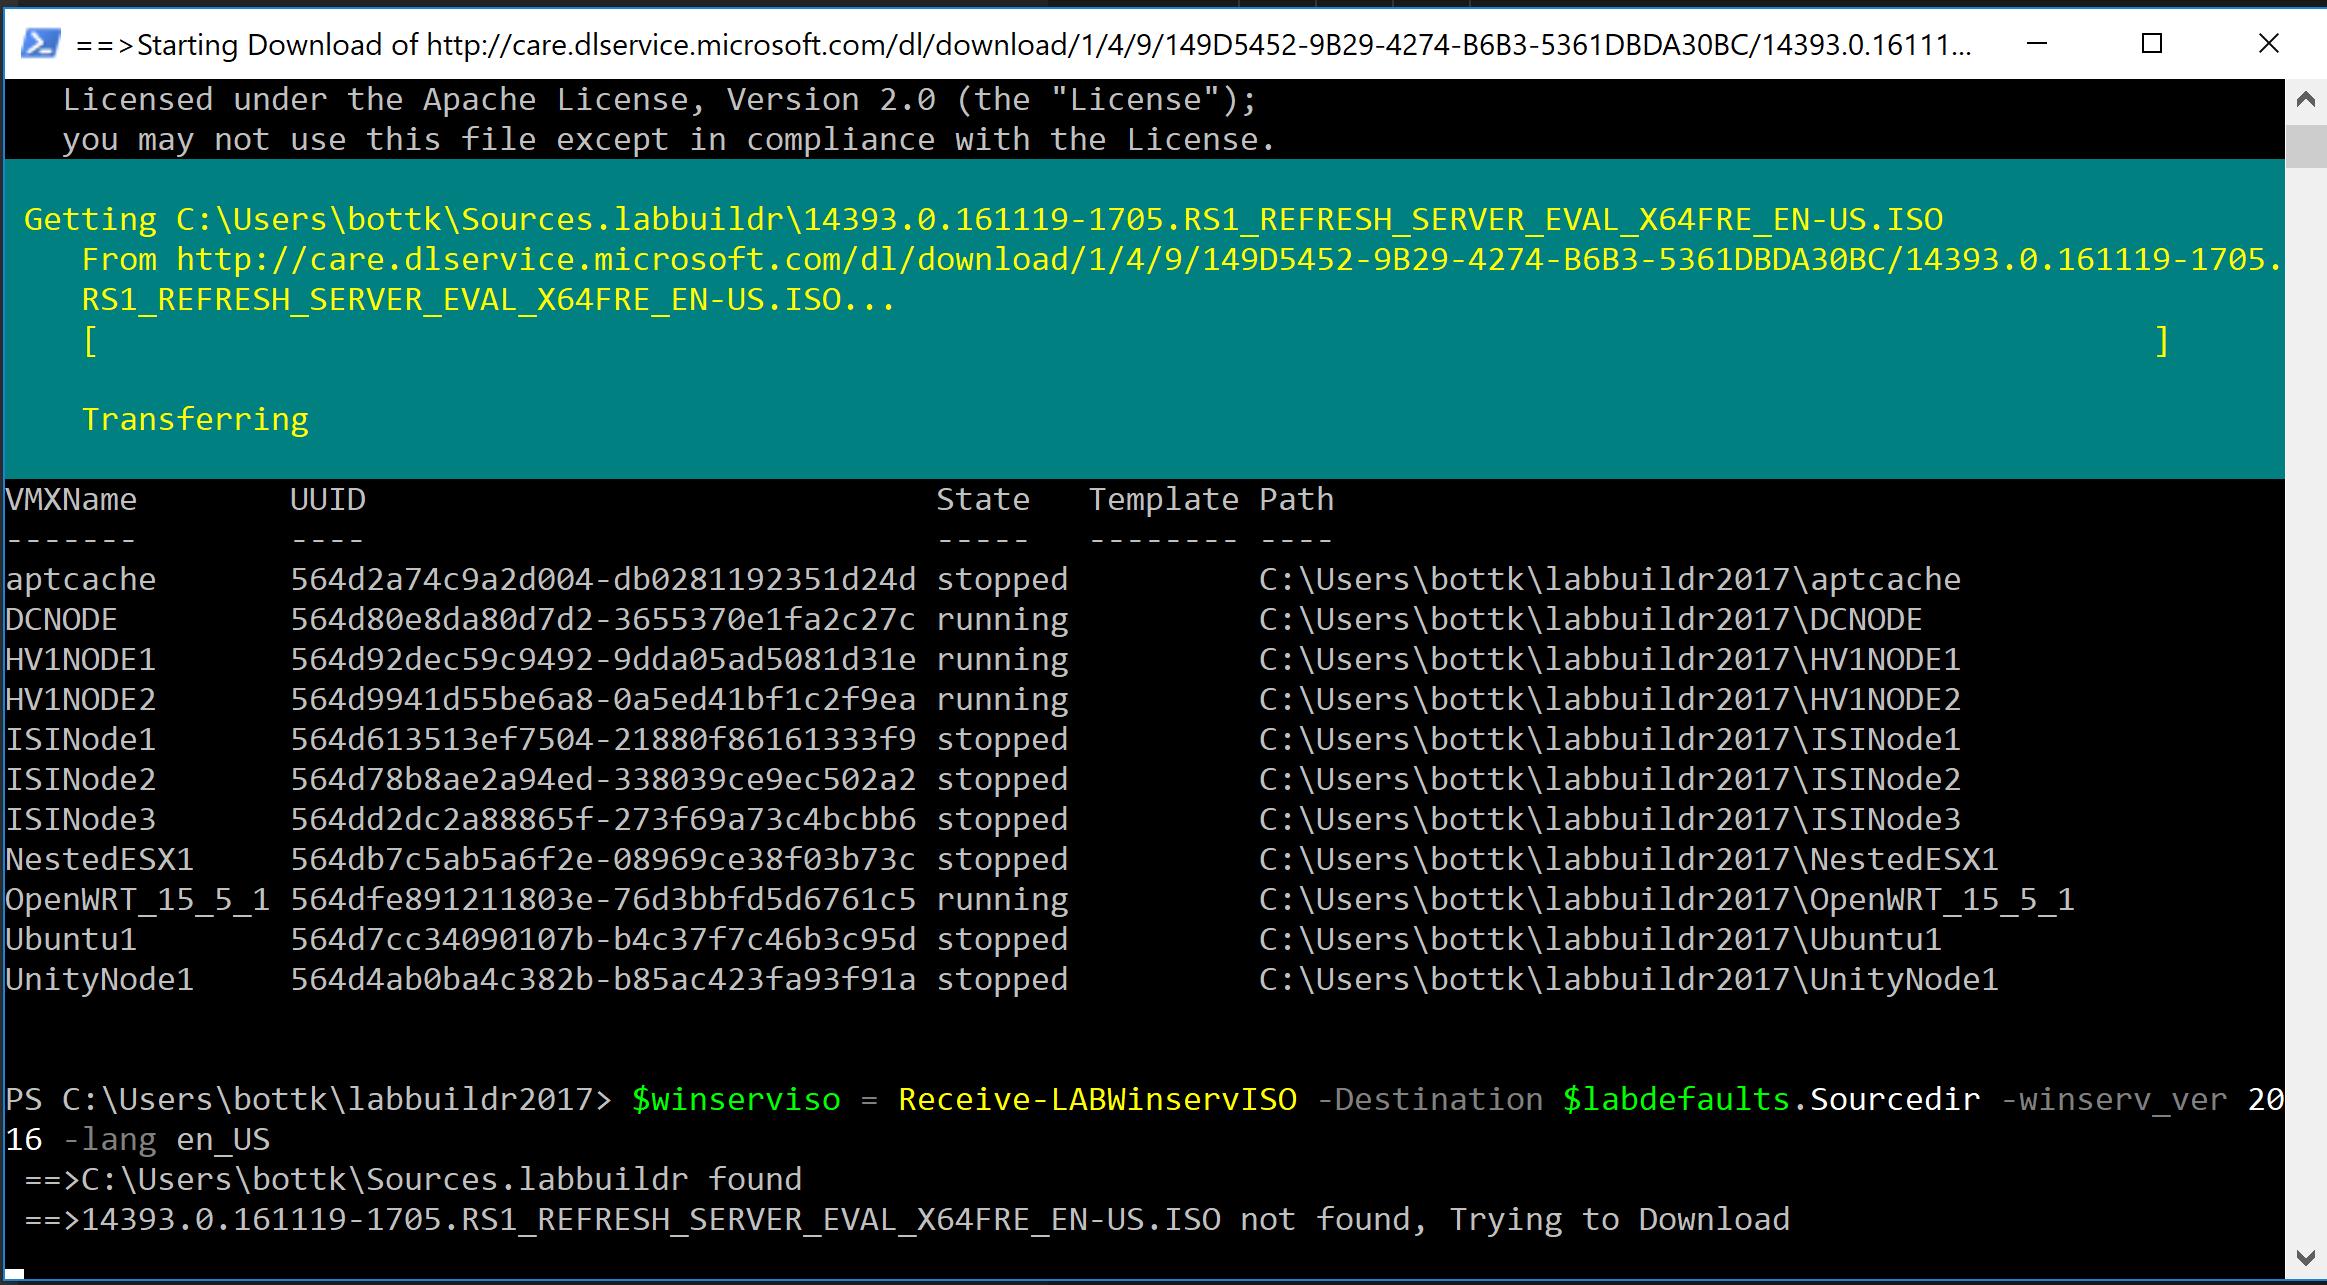 Creating a Windows Master - labbuildr